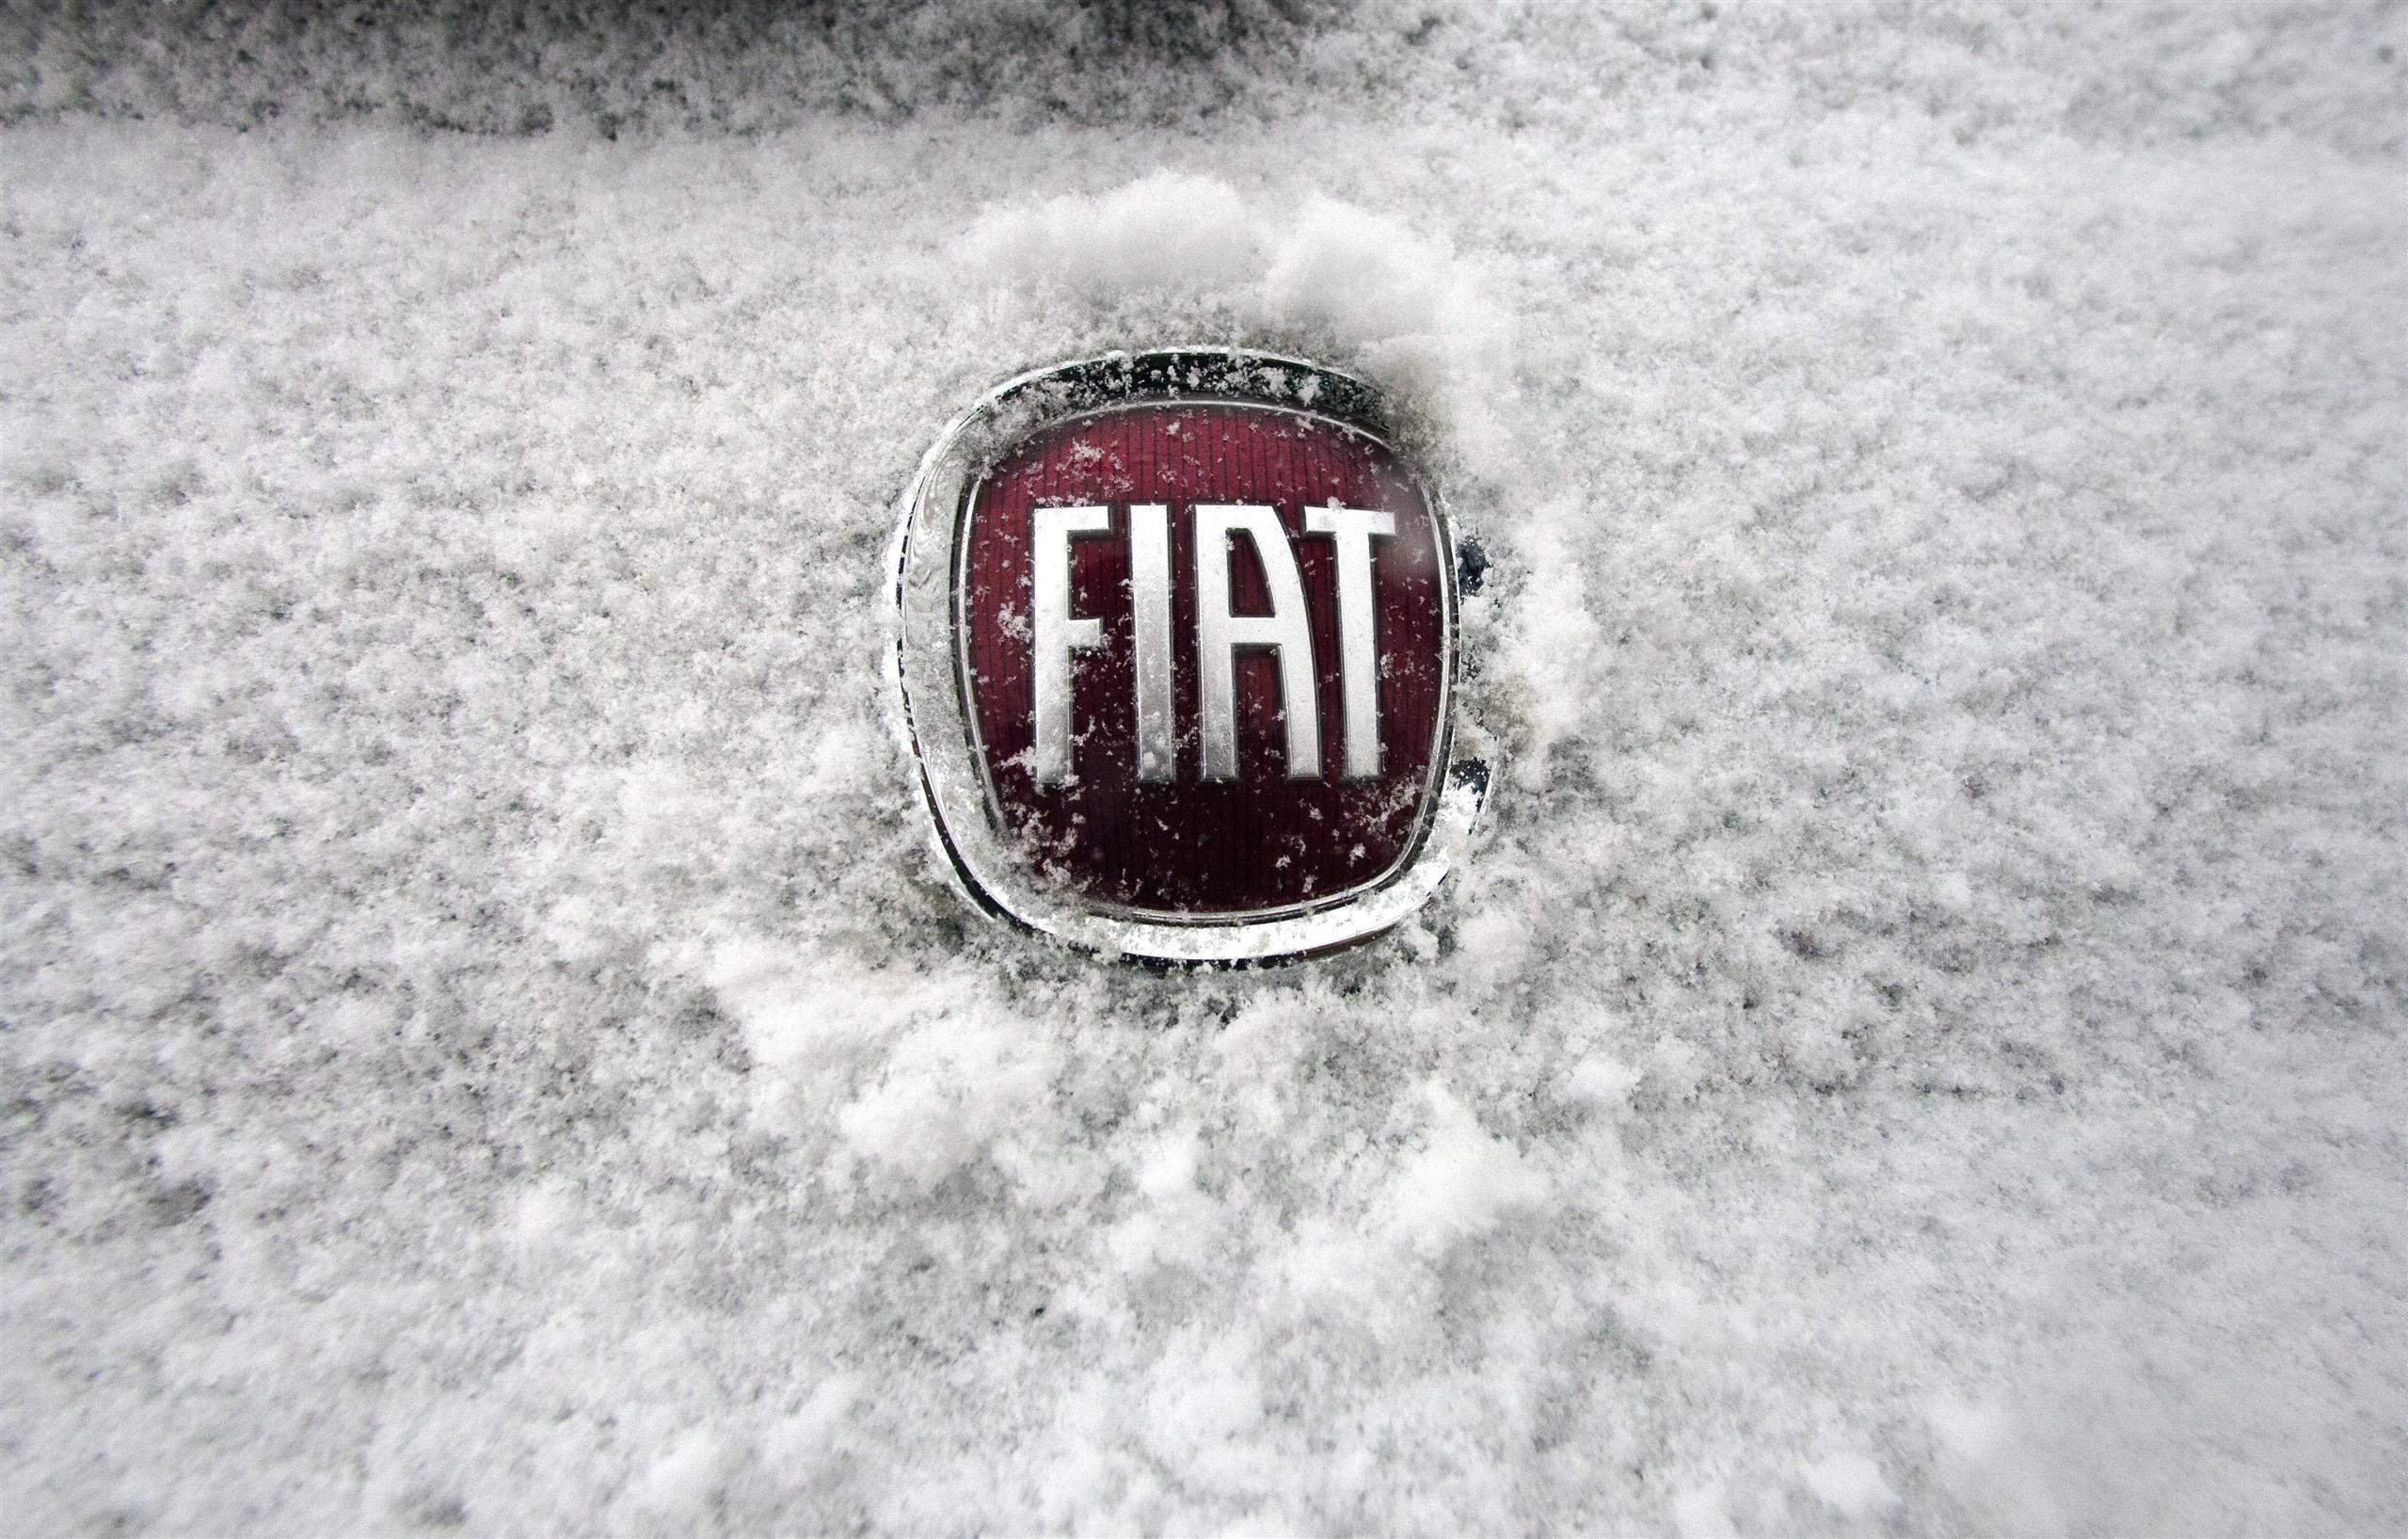 Fiat HD Wallpaper Autom³veis Pinterest